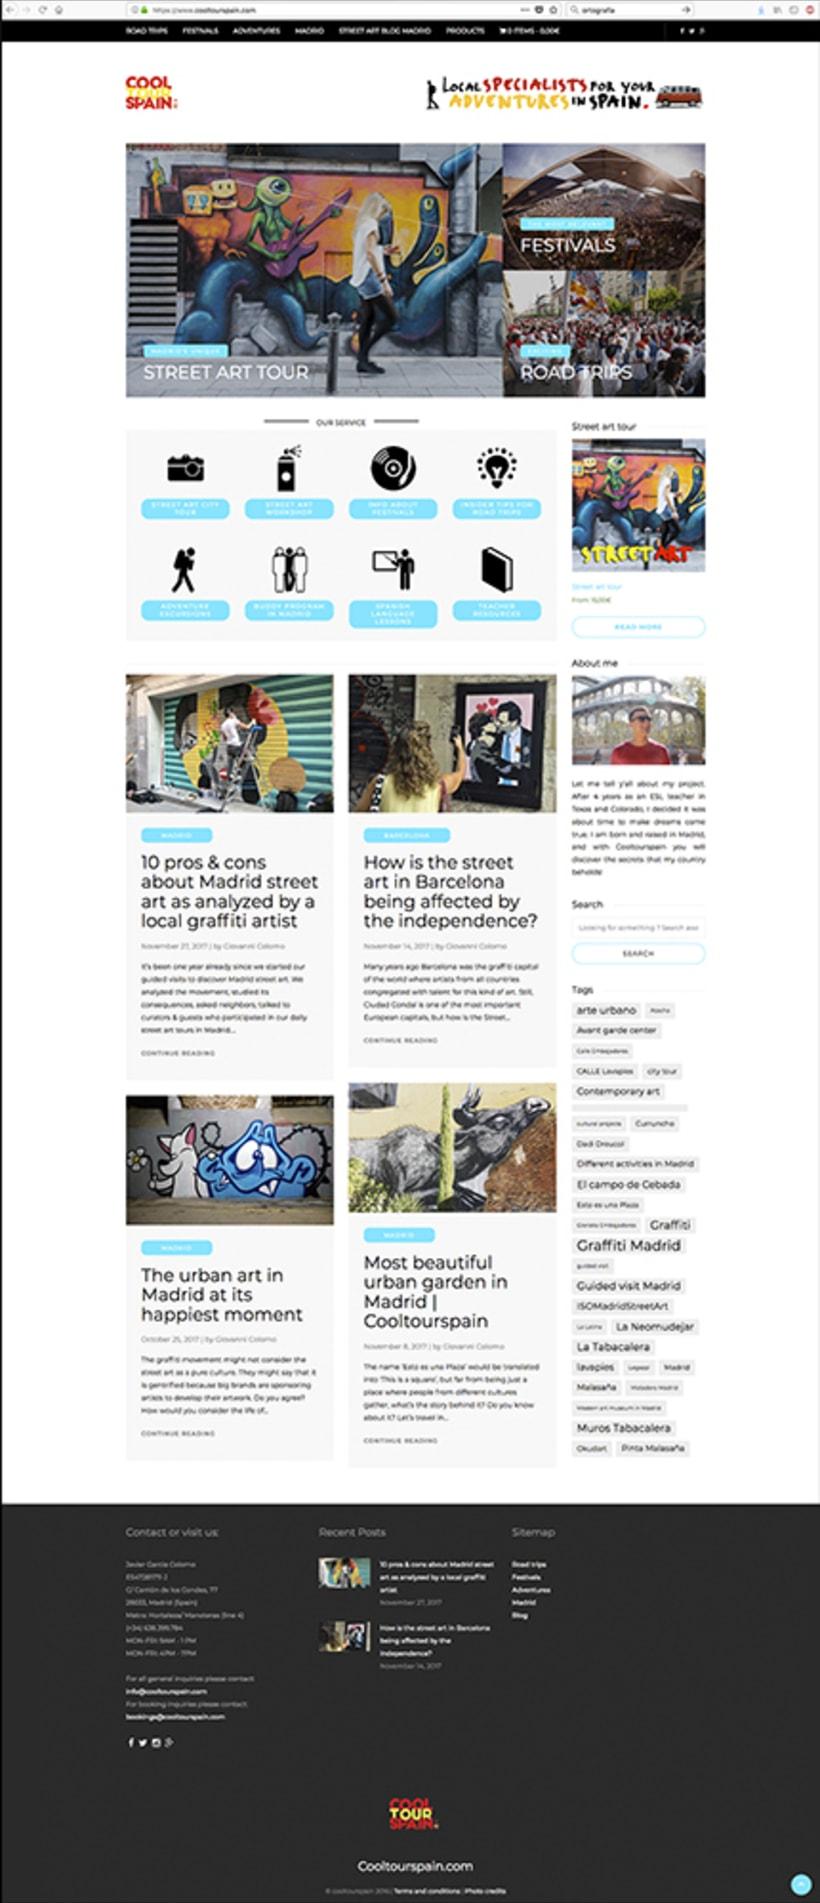 Cooltourspain espacio web. 0